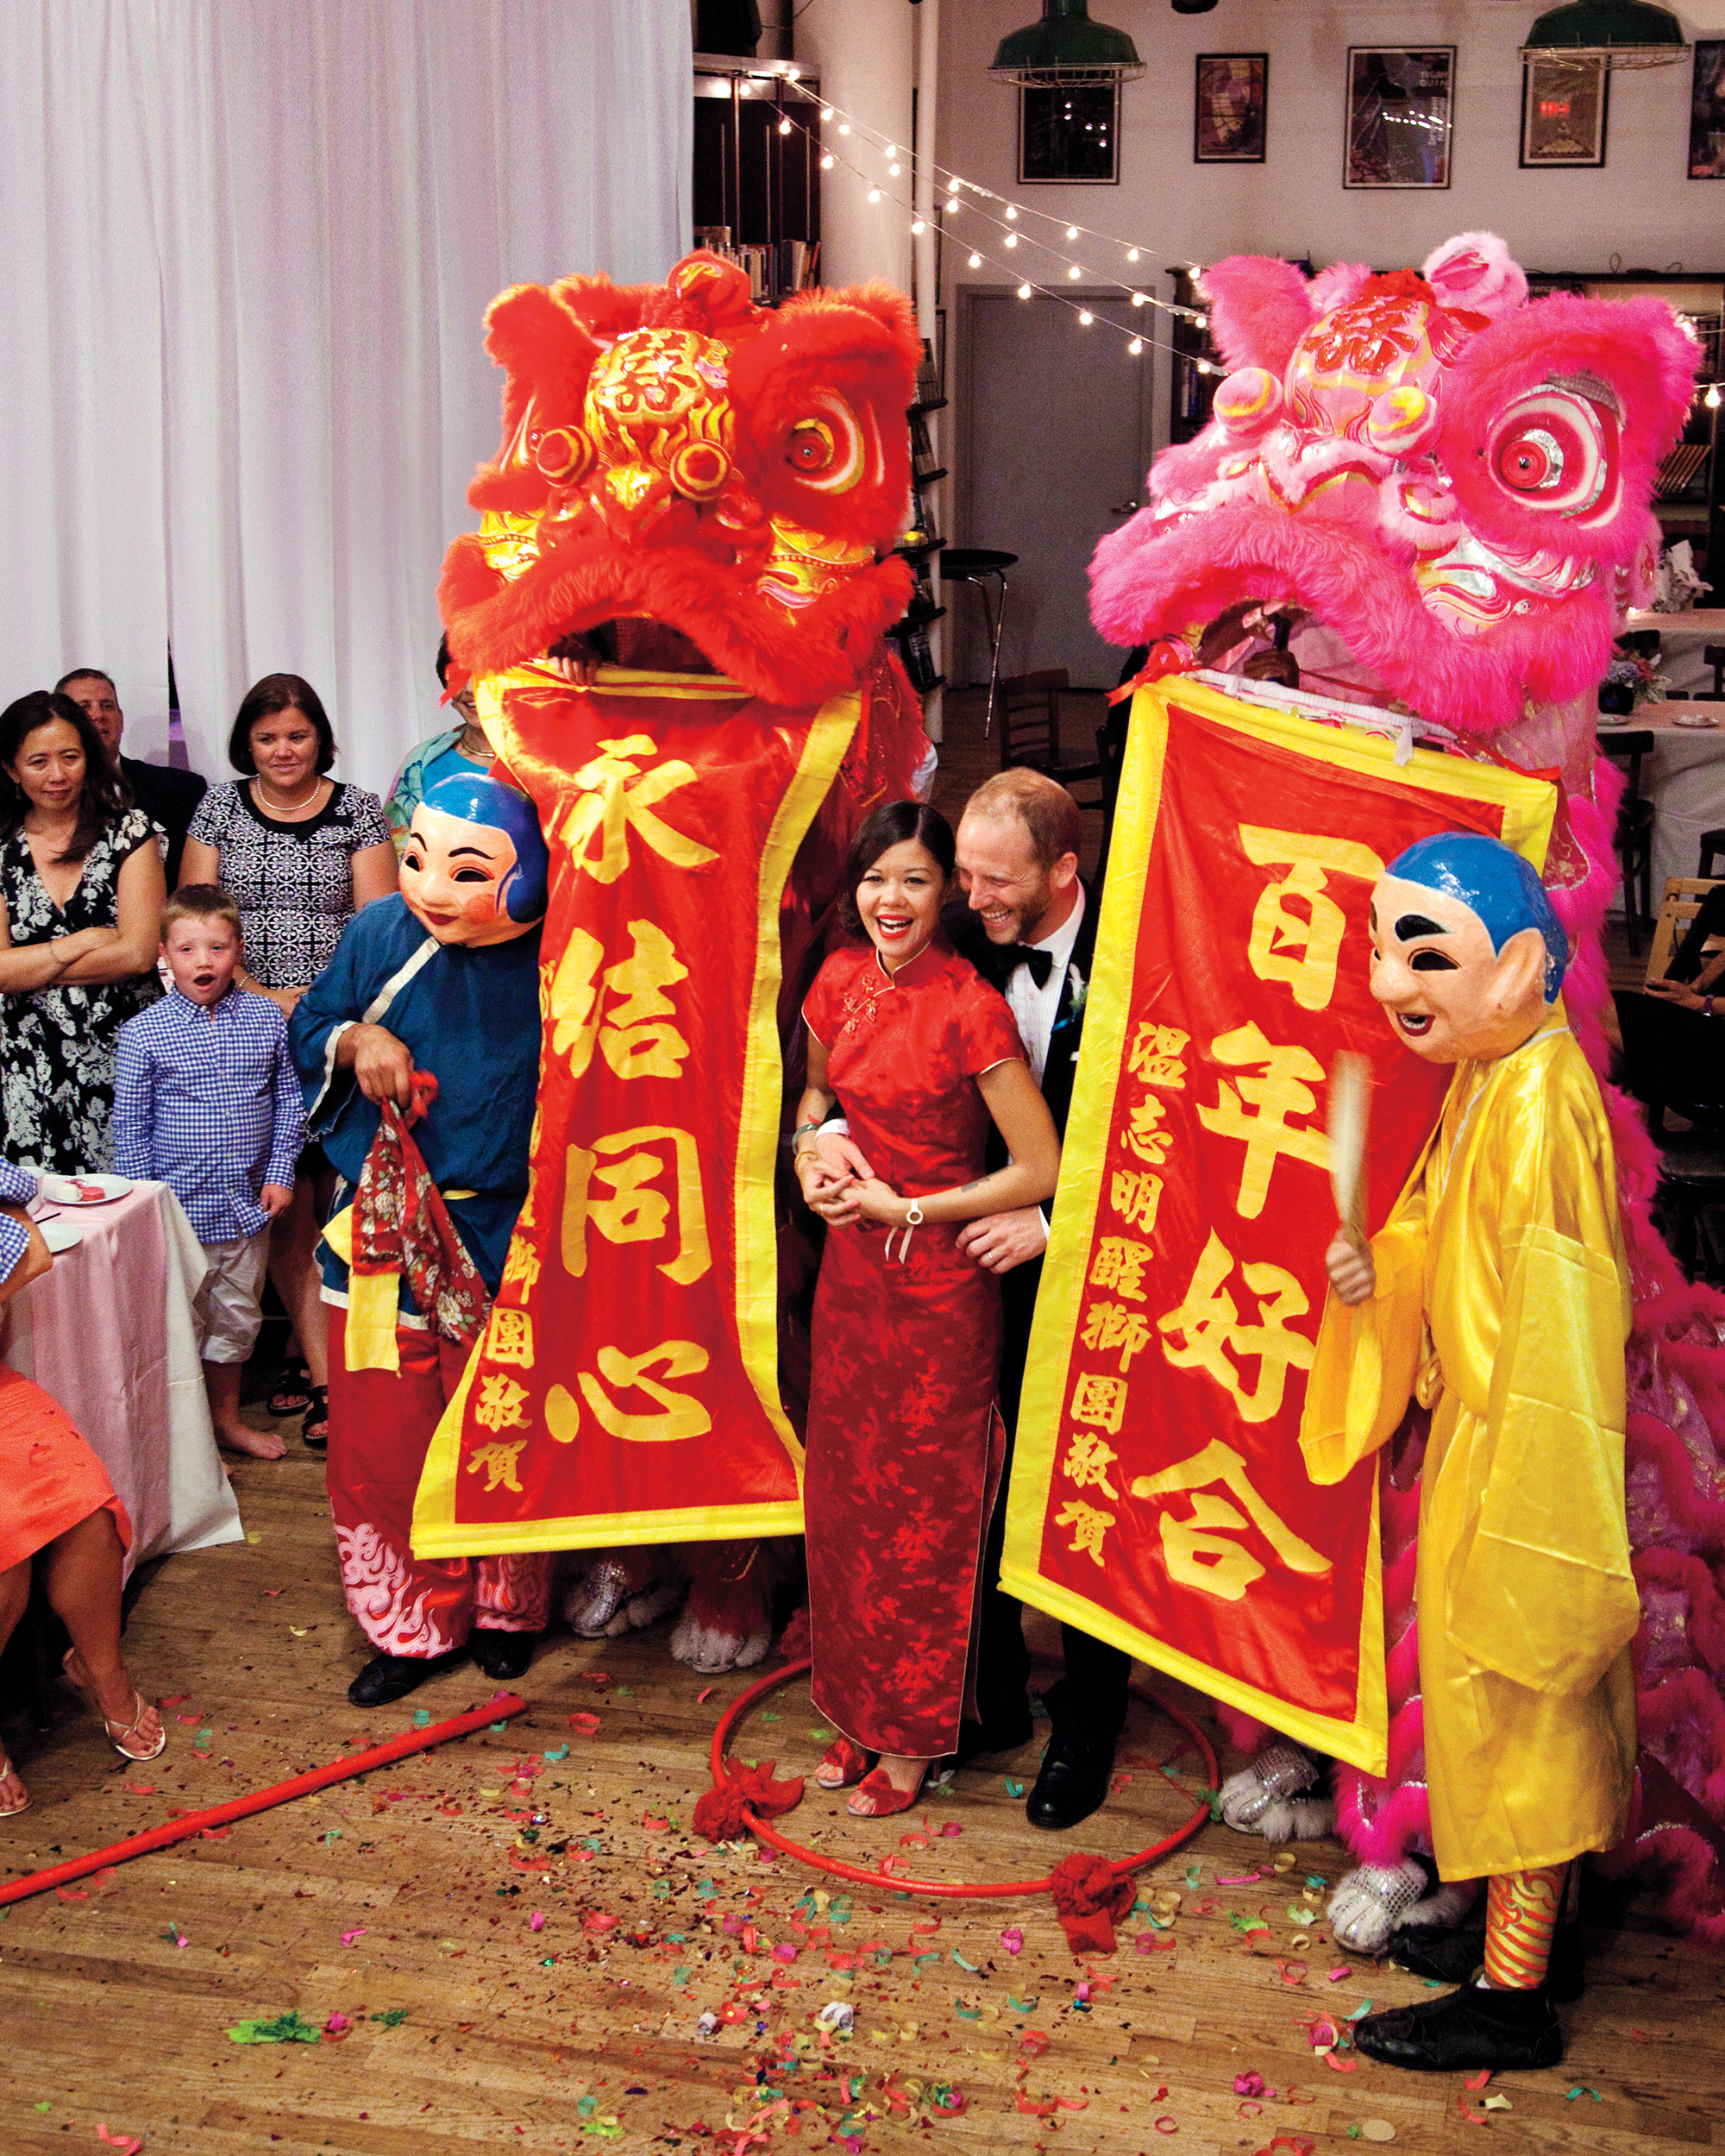 dragon-dance-021-mwd10900620.jpg